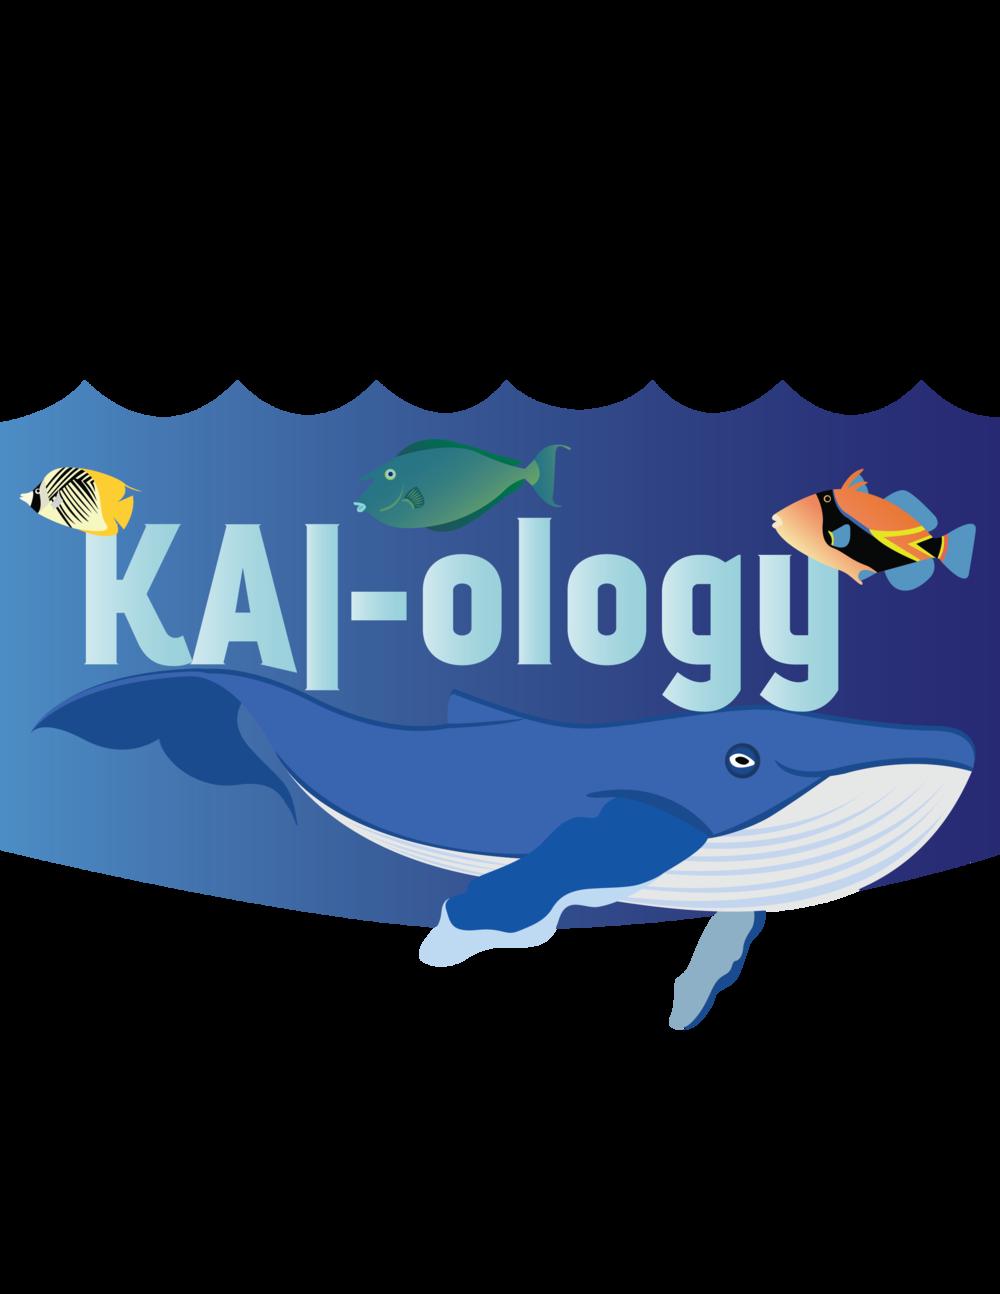 Imiloa Kids Camp: Kai-ology